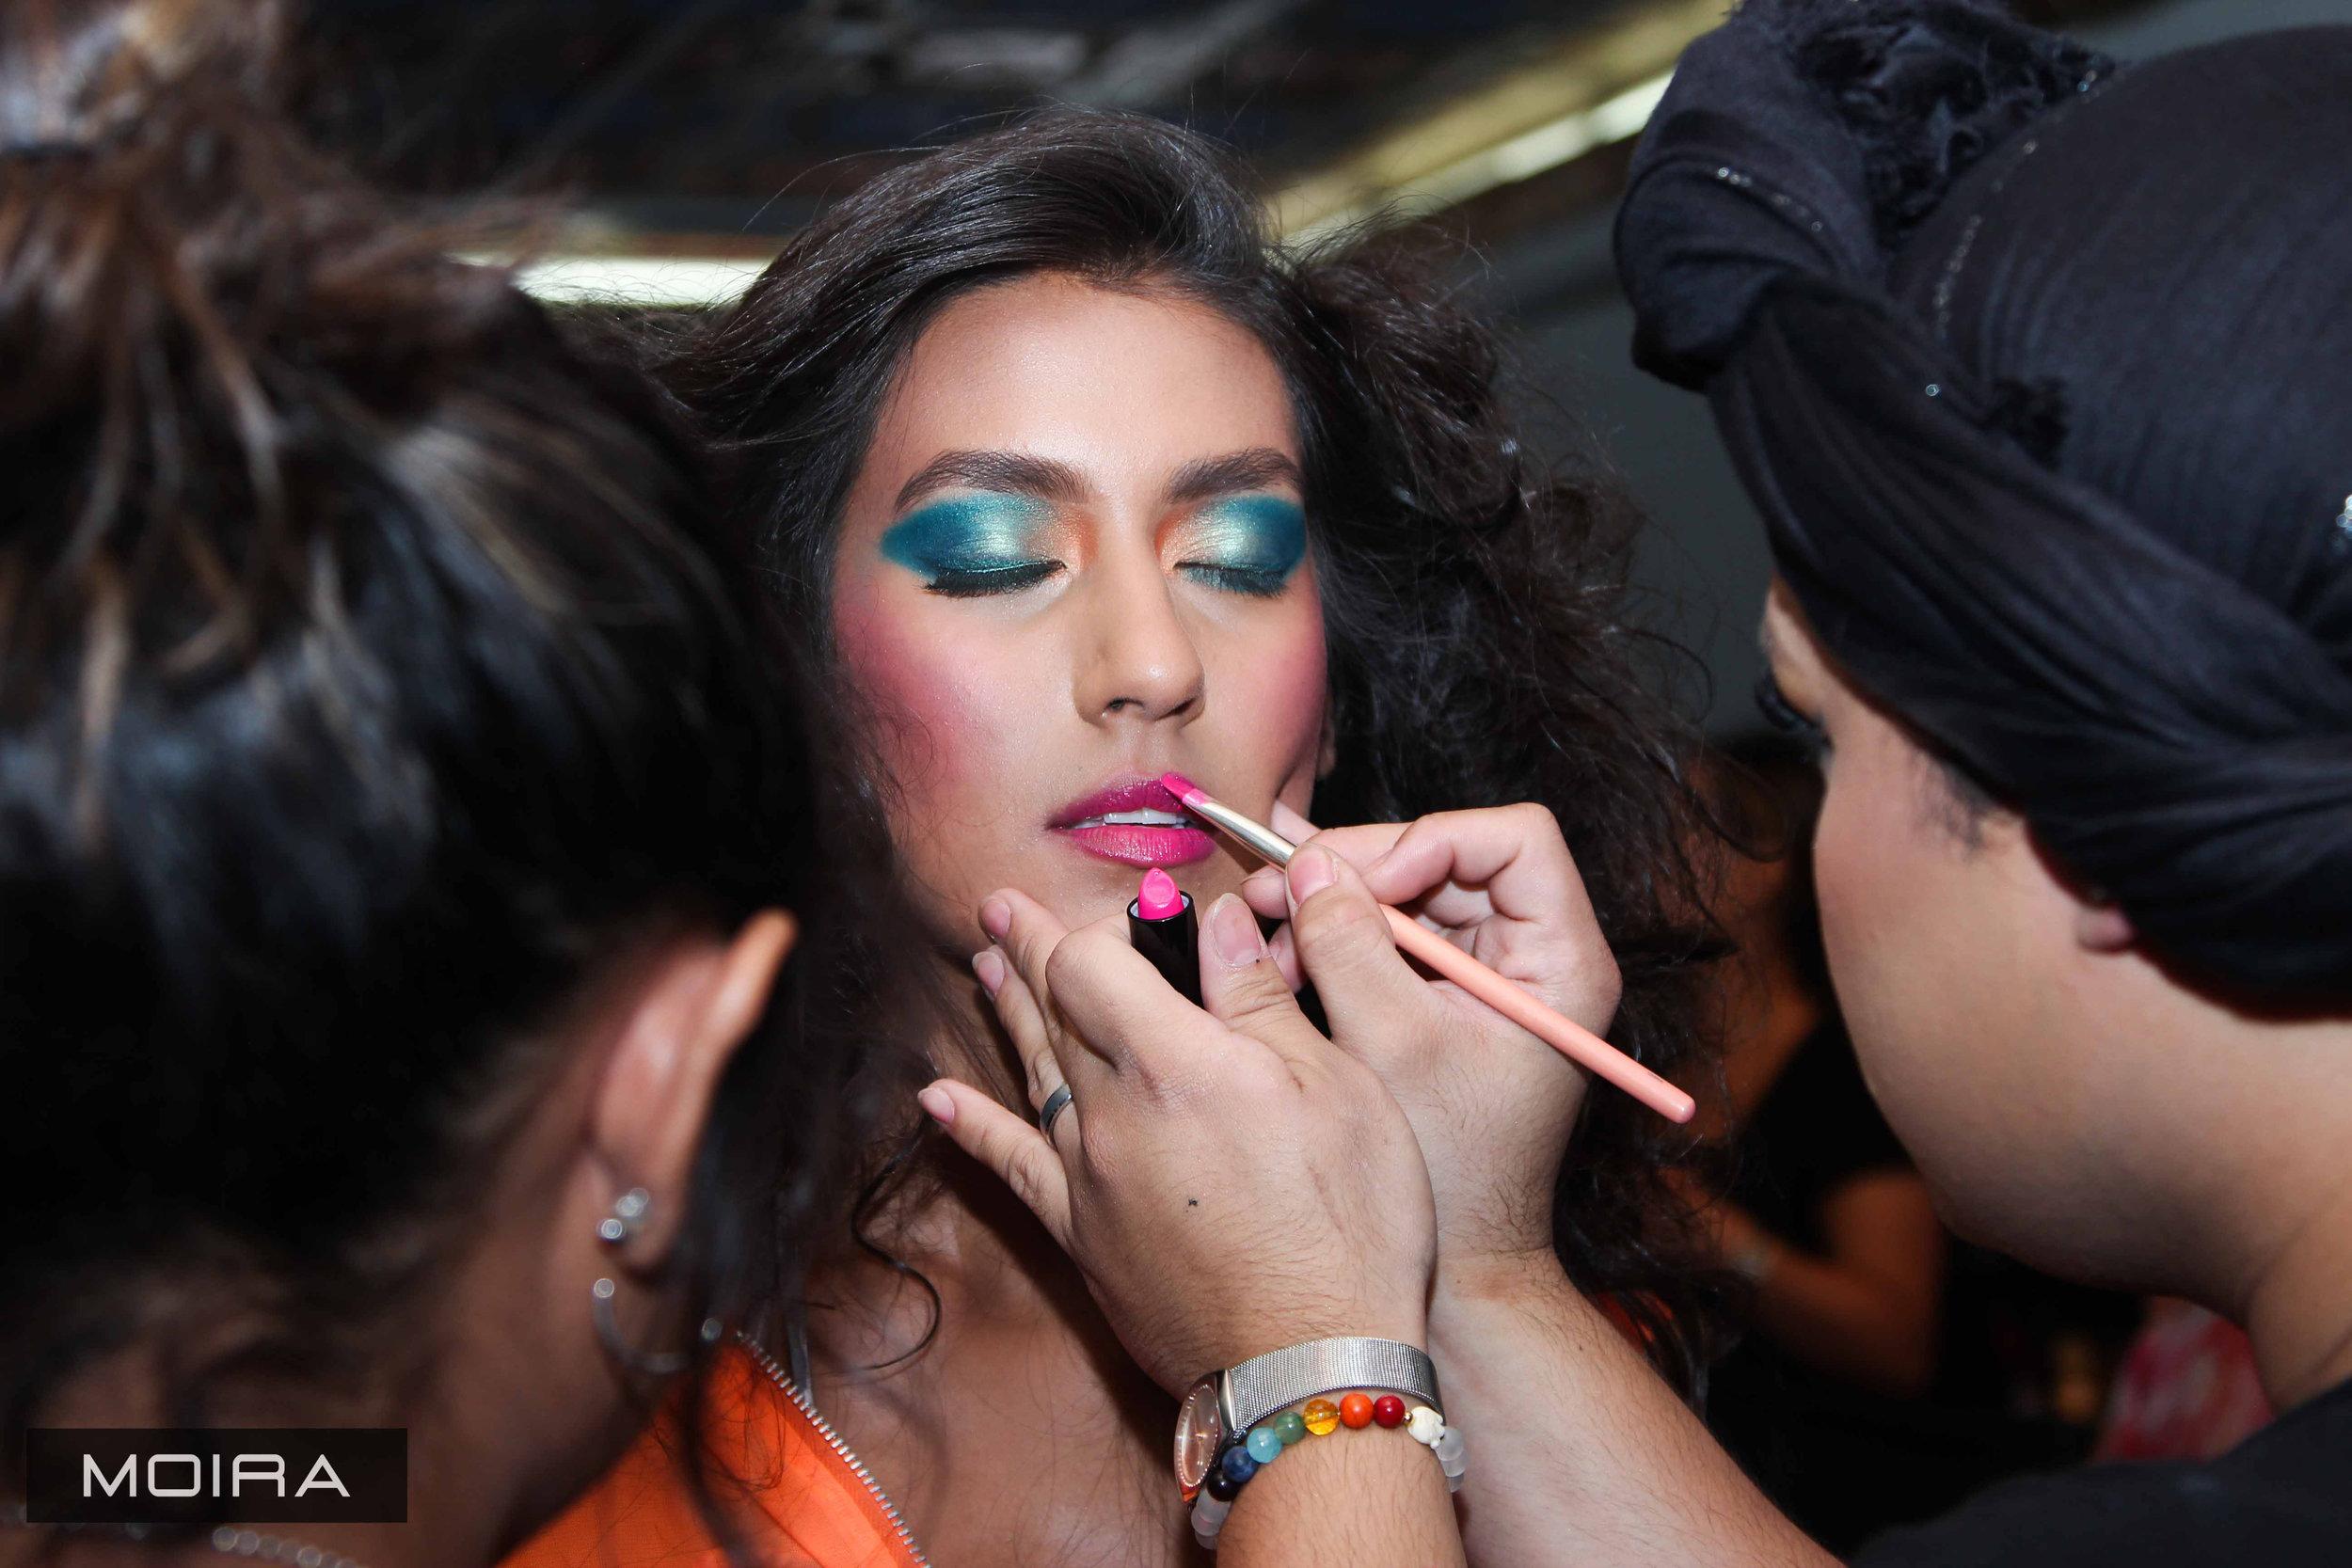 MOIRA_Cosmetics_New_York_Fashion_Week_2018-77.jpg